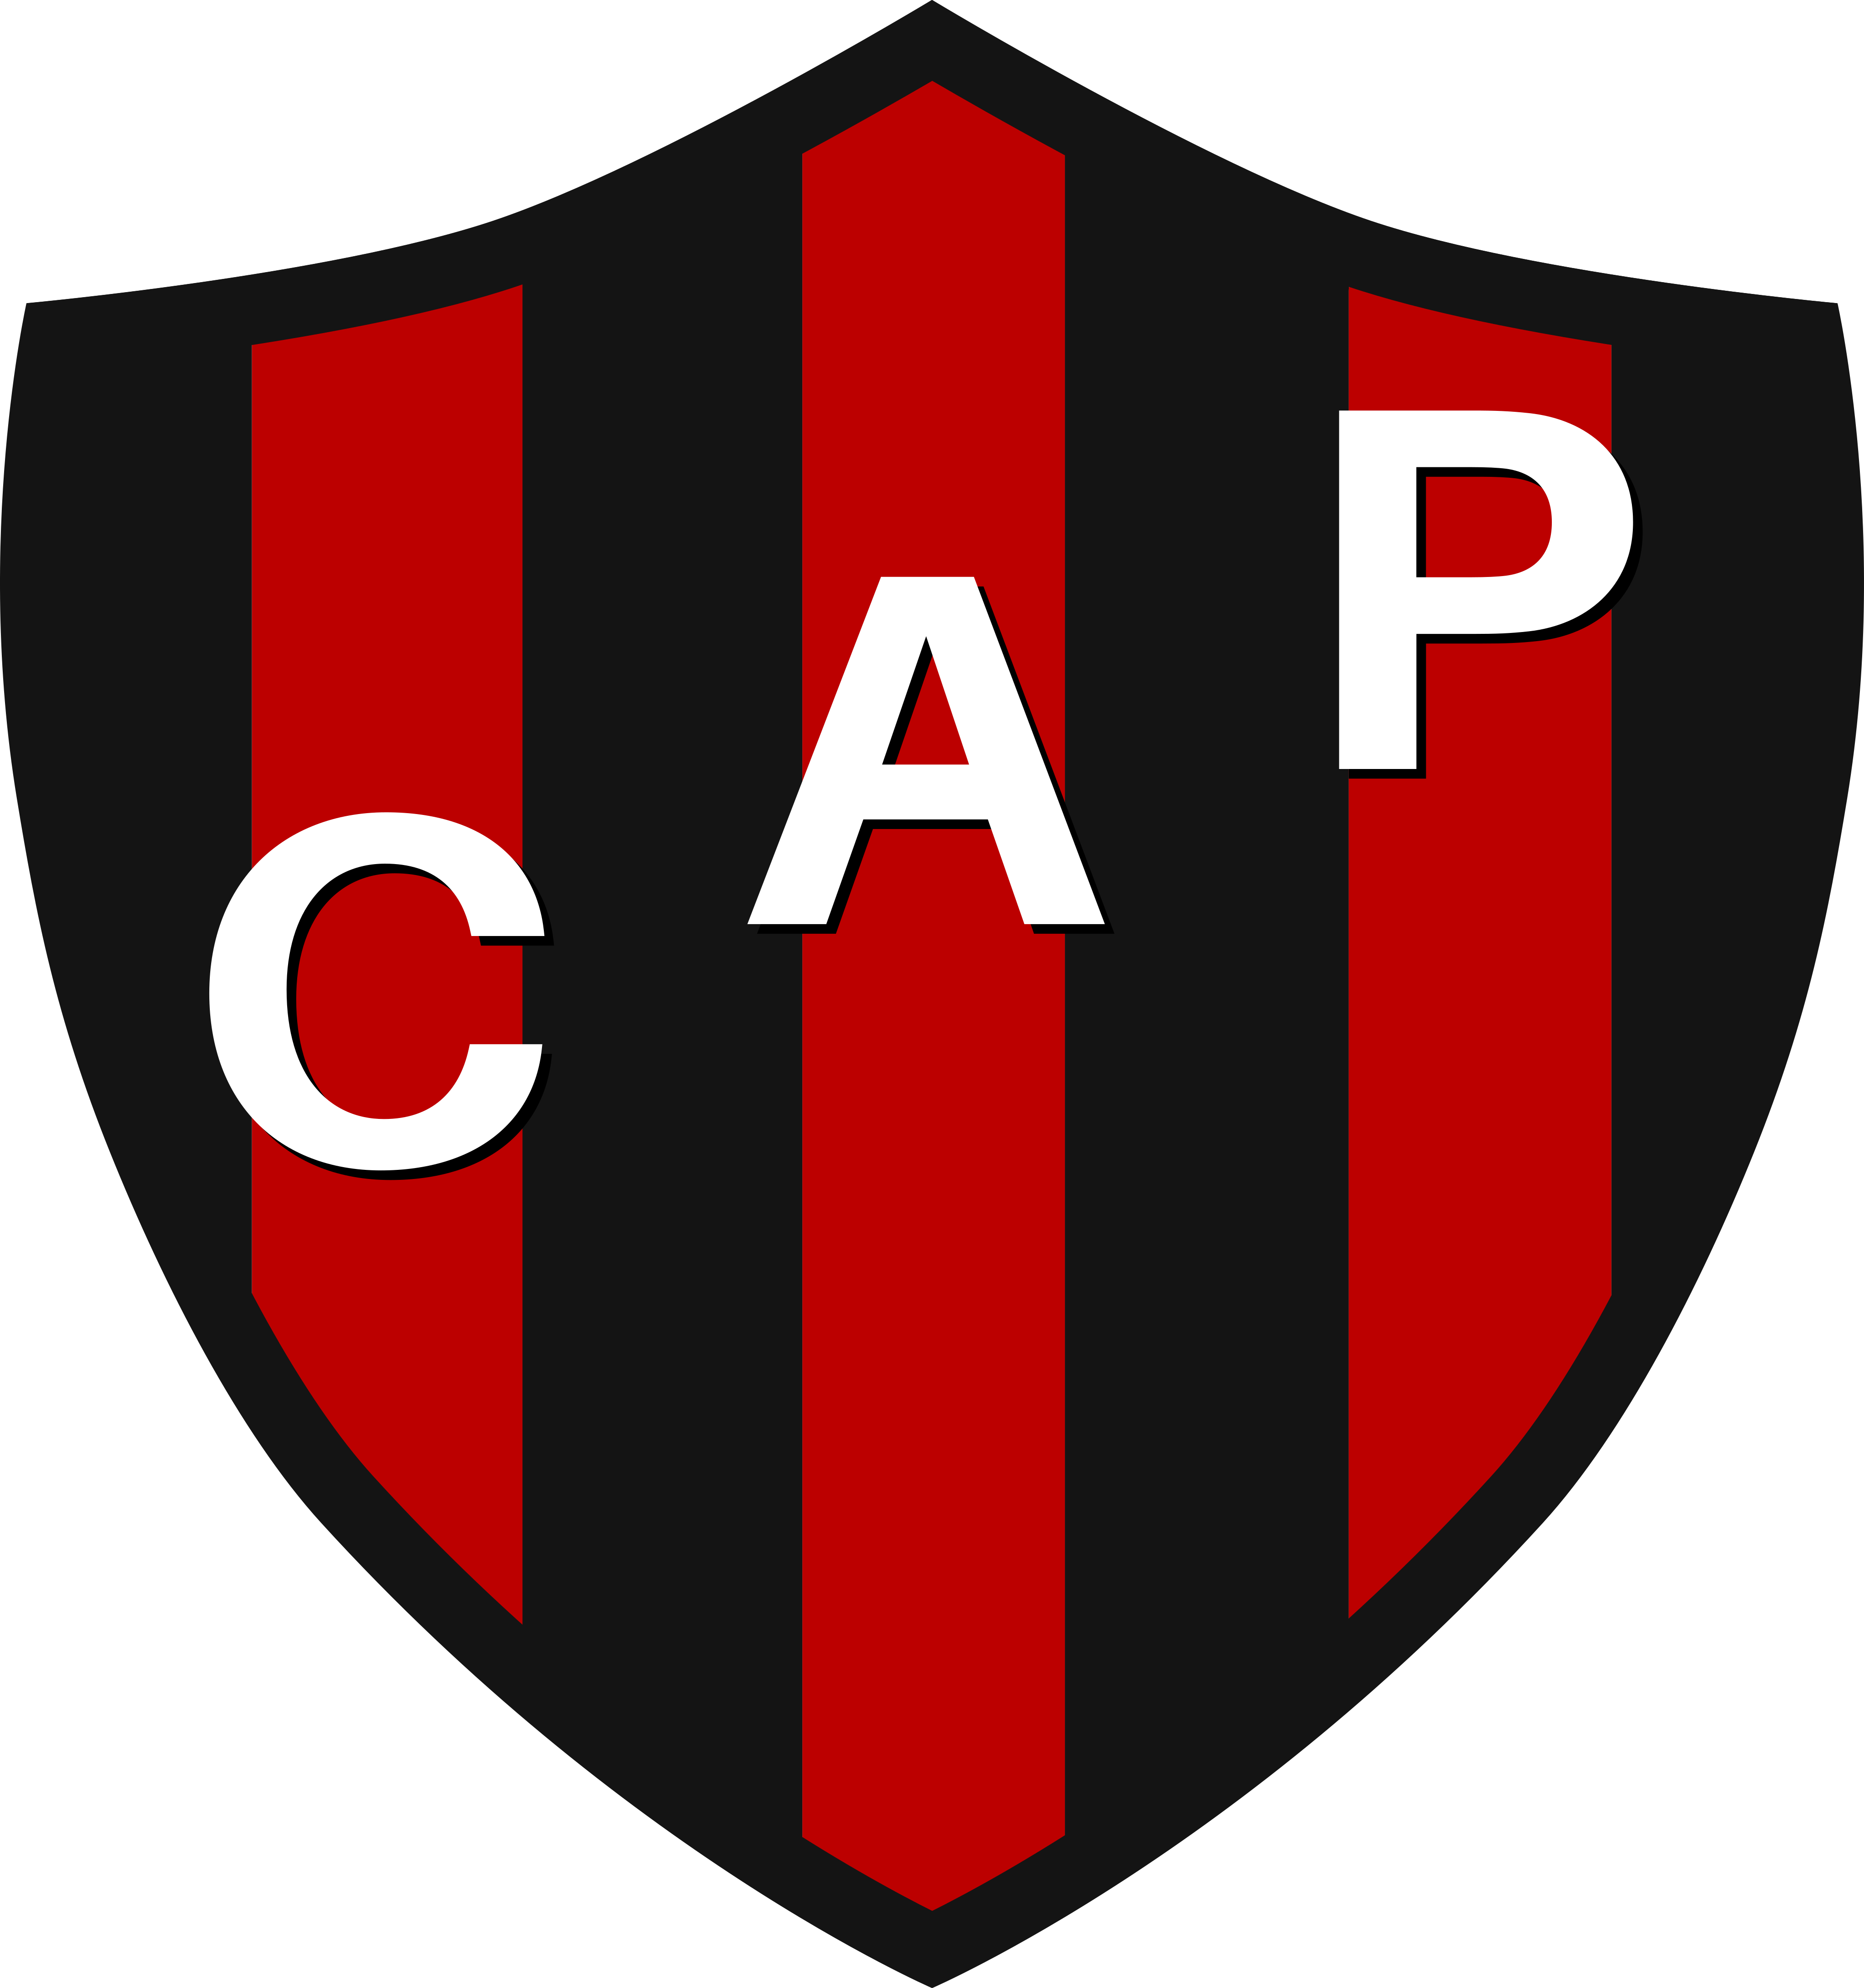 ca patronato logo - Club Atlético Patronato Logo – Escudo